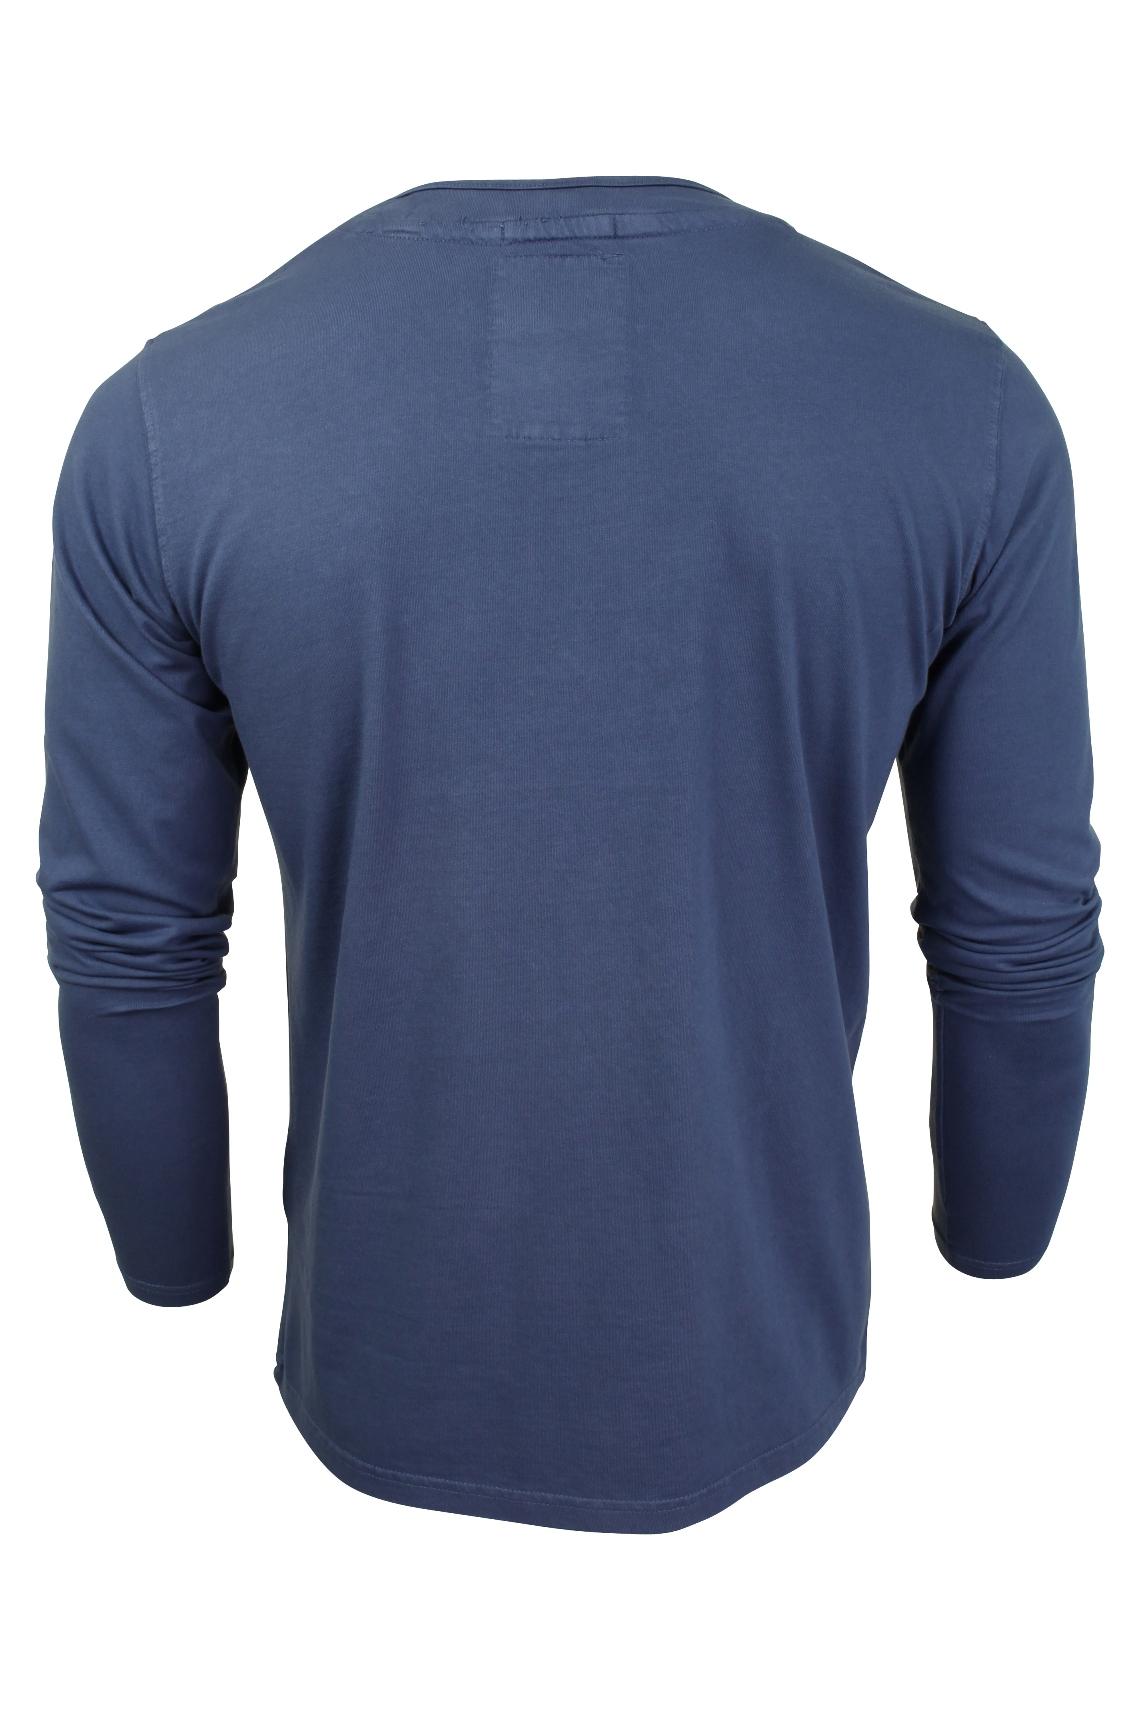 Mens-Grandad-T-Shirt-by-Tokyo-Laundry-039-Winter-Pines-039-Long-Sleeved thumbnail 8